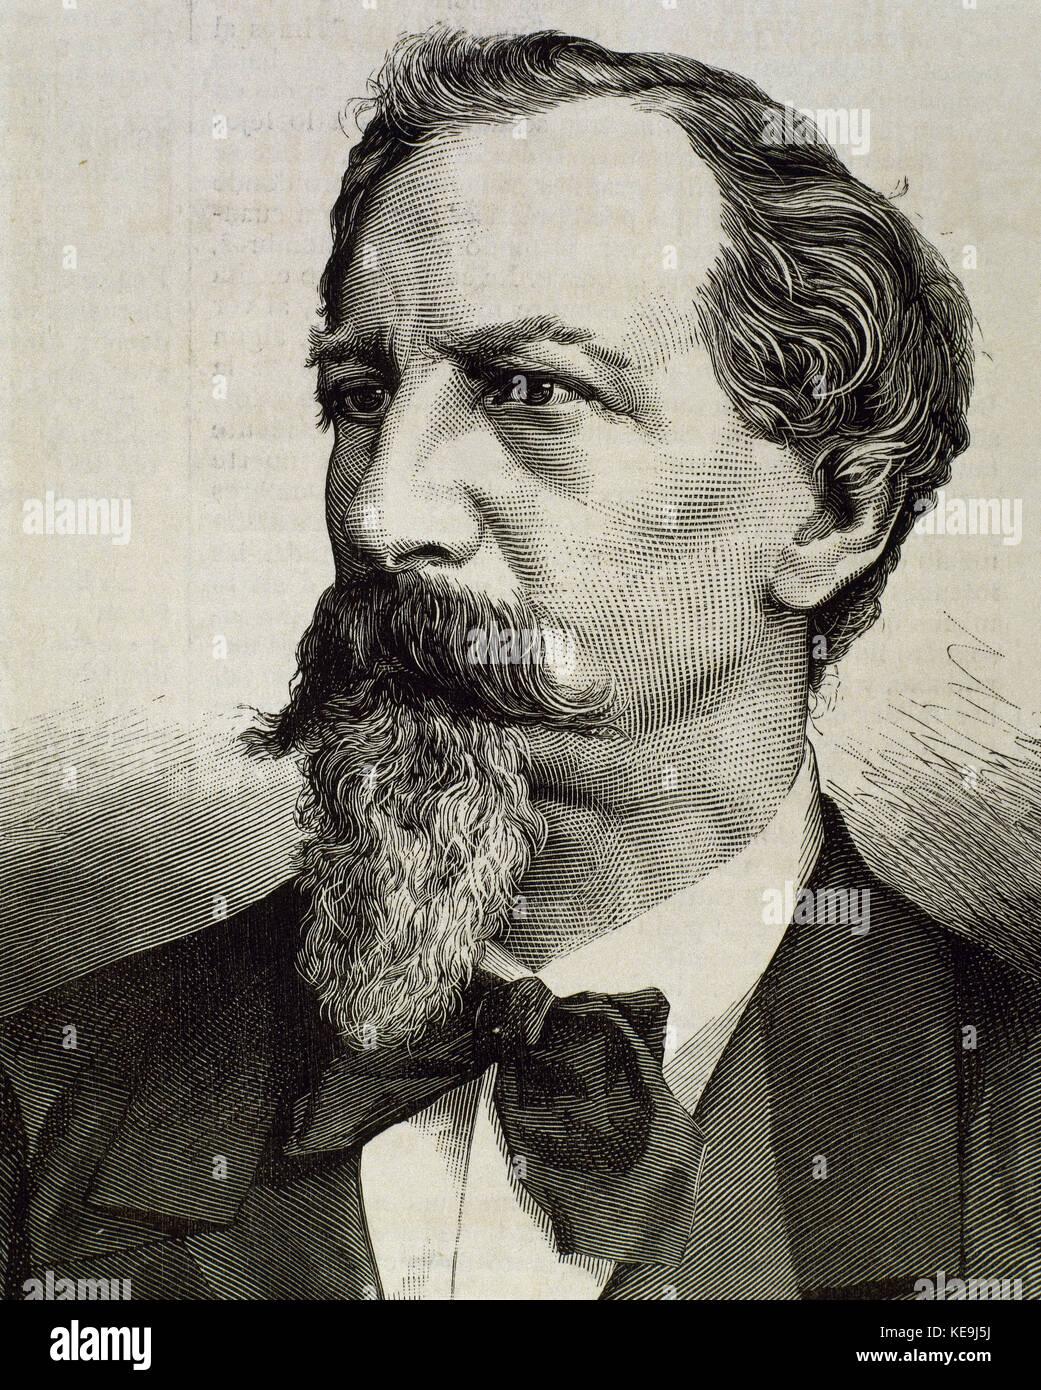 King Fernando II (Ferdinand II) of Portugal (Vienna,1816-Lisbon,1885) - Stock Image